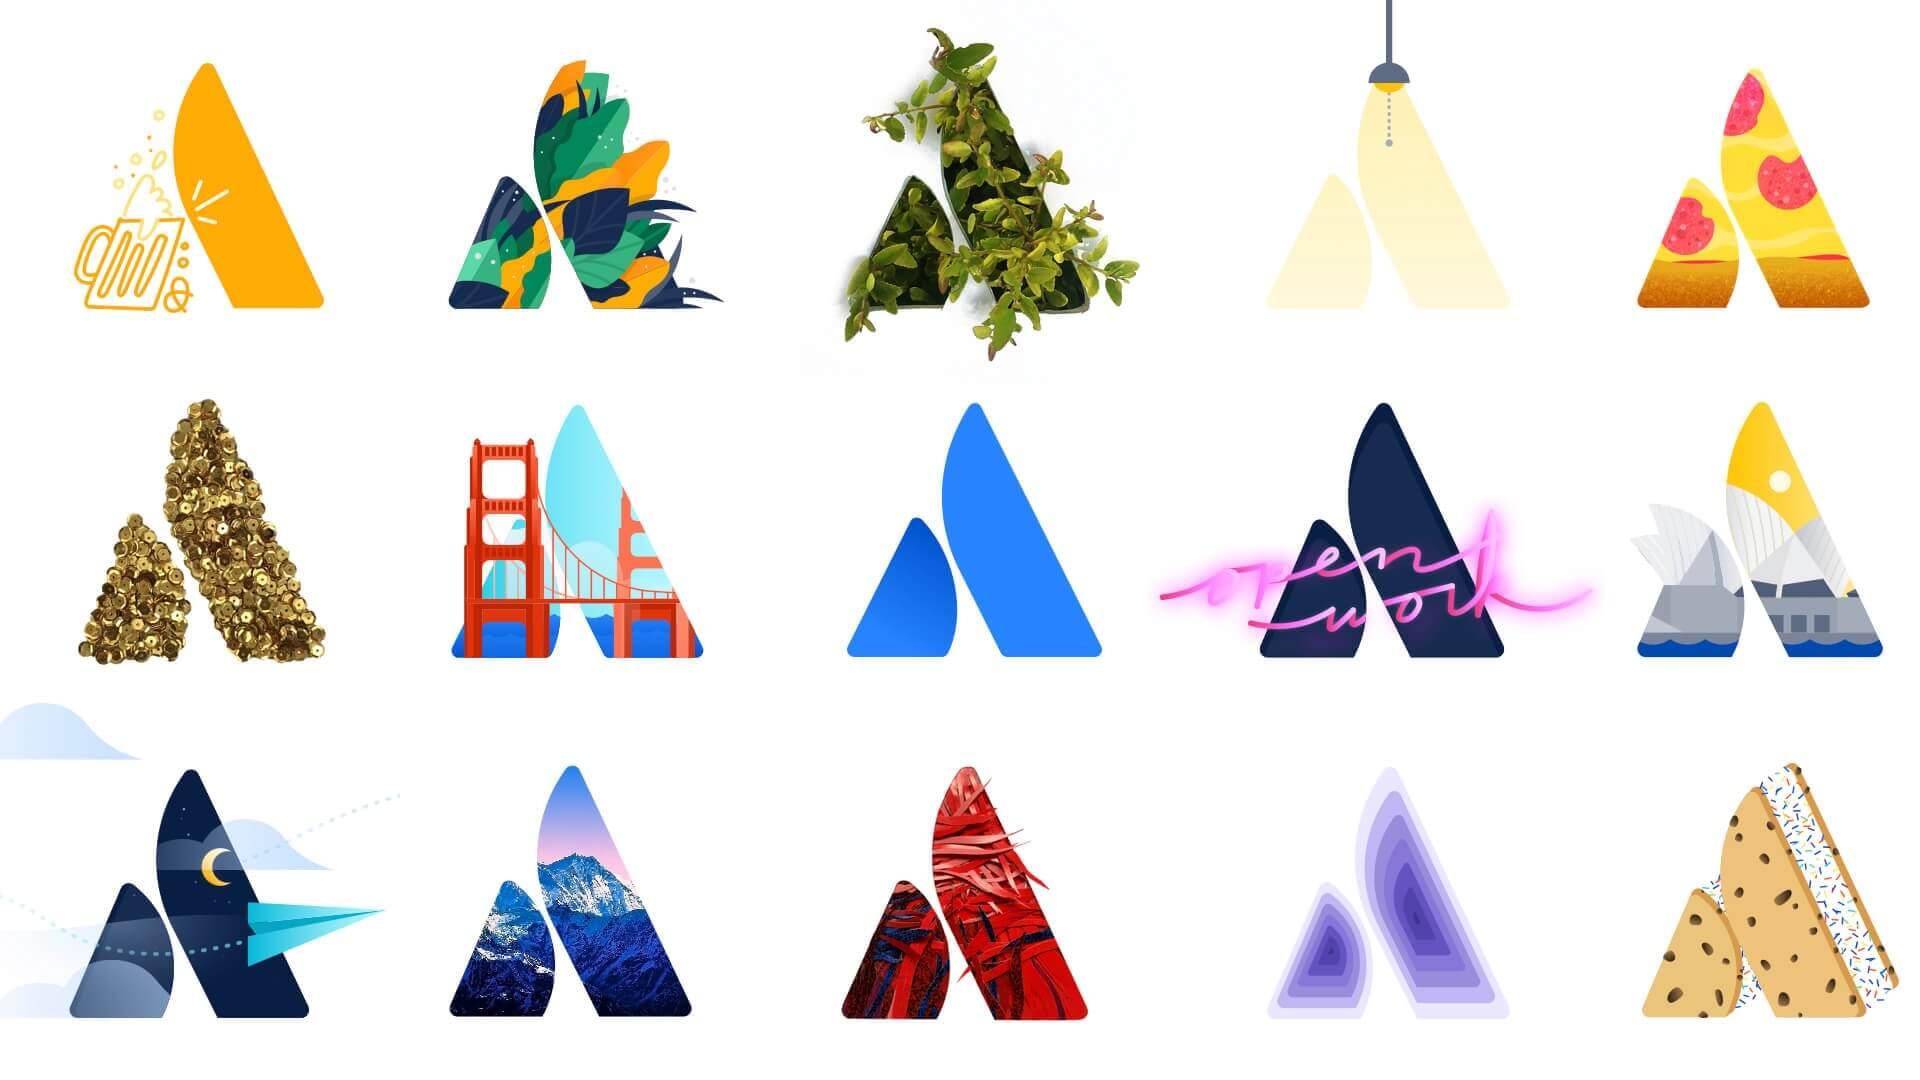 Atlassian logos with unique designs